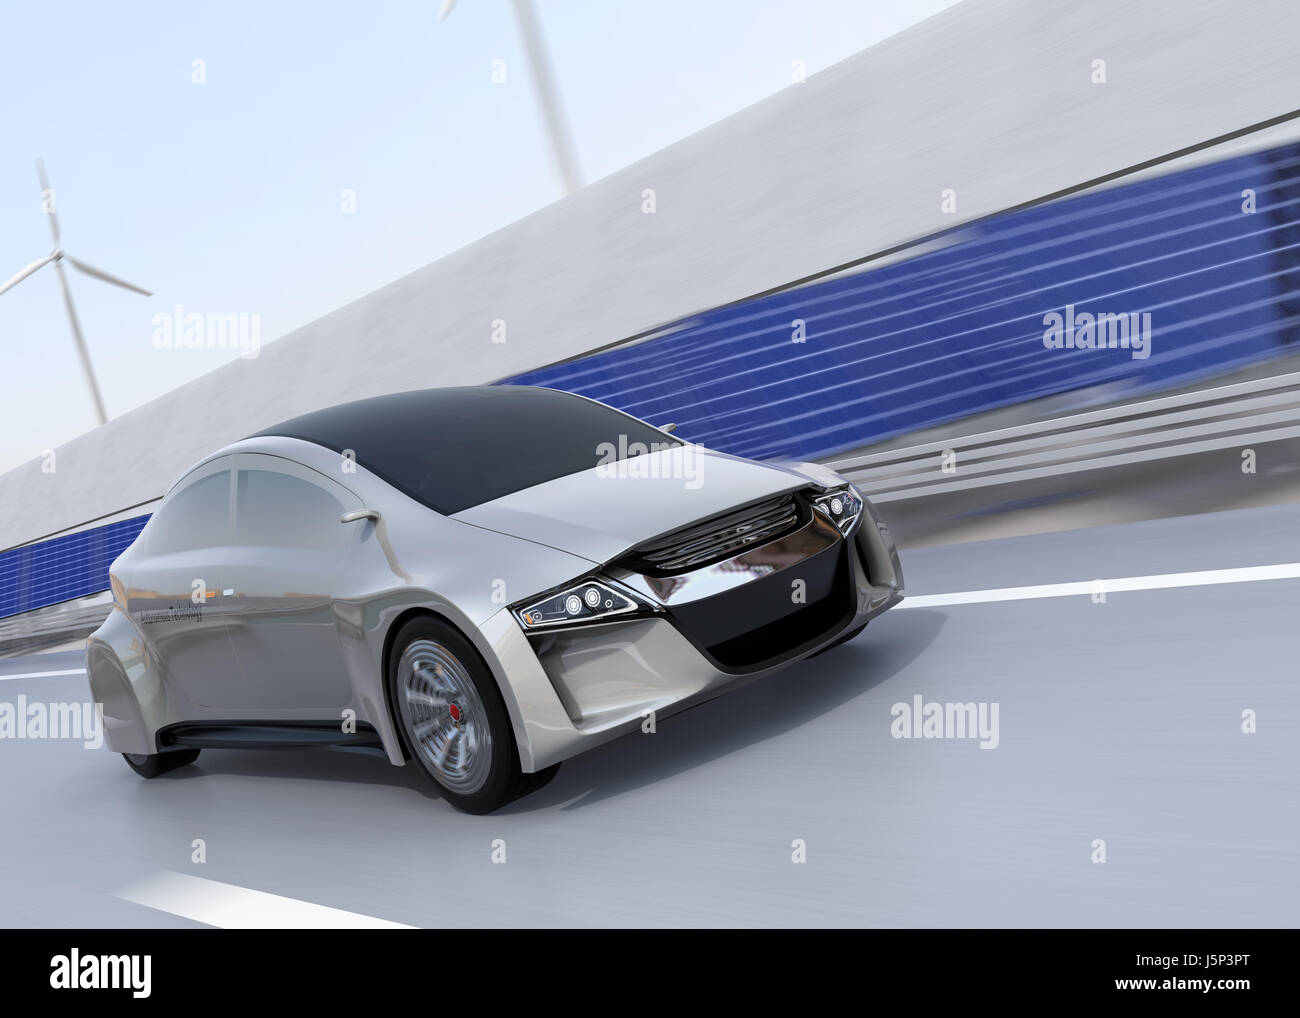 elektro auto auf der kabellose ladestation spur der. Black Bedroom Furniture Sets. Home Design Ideas